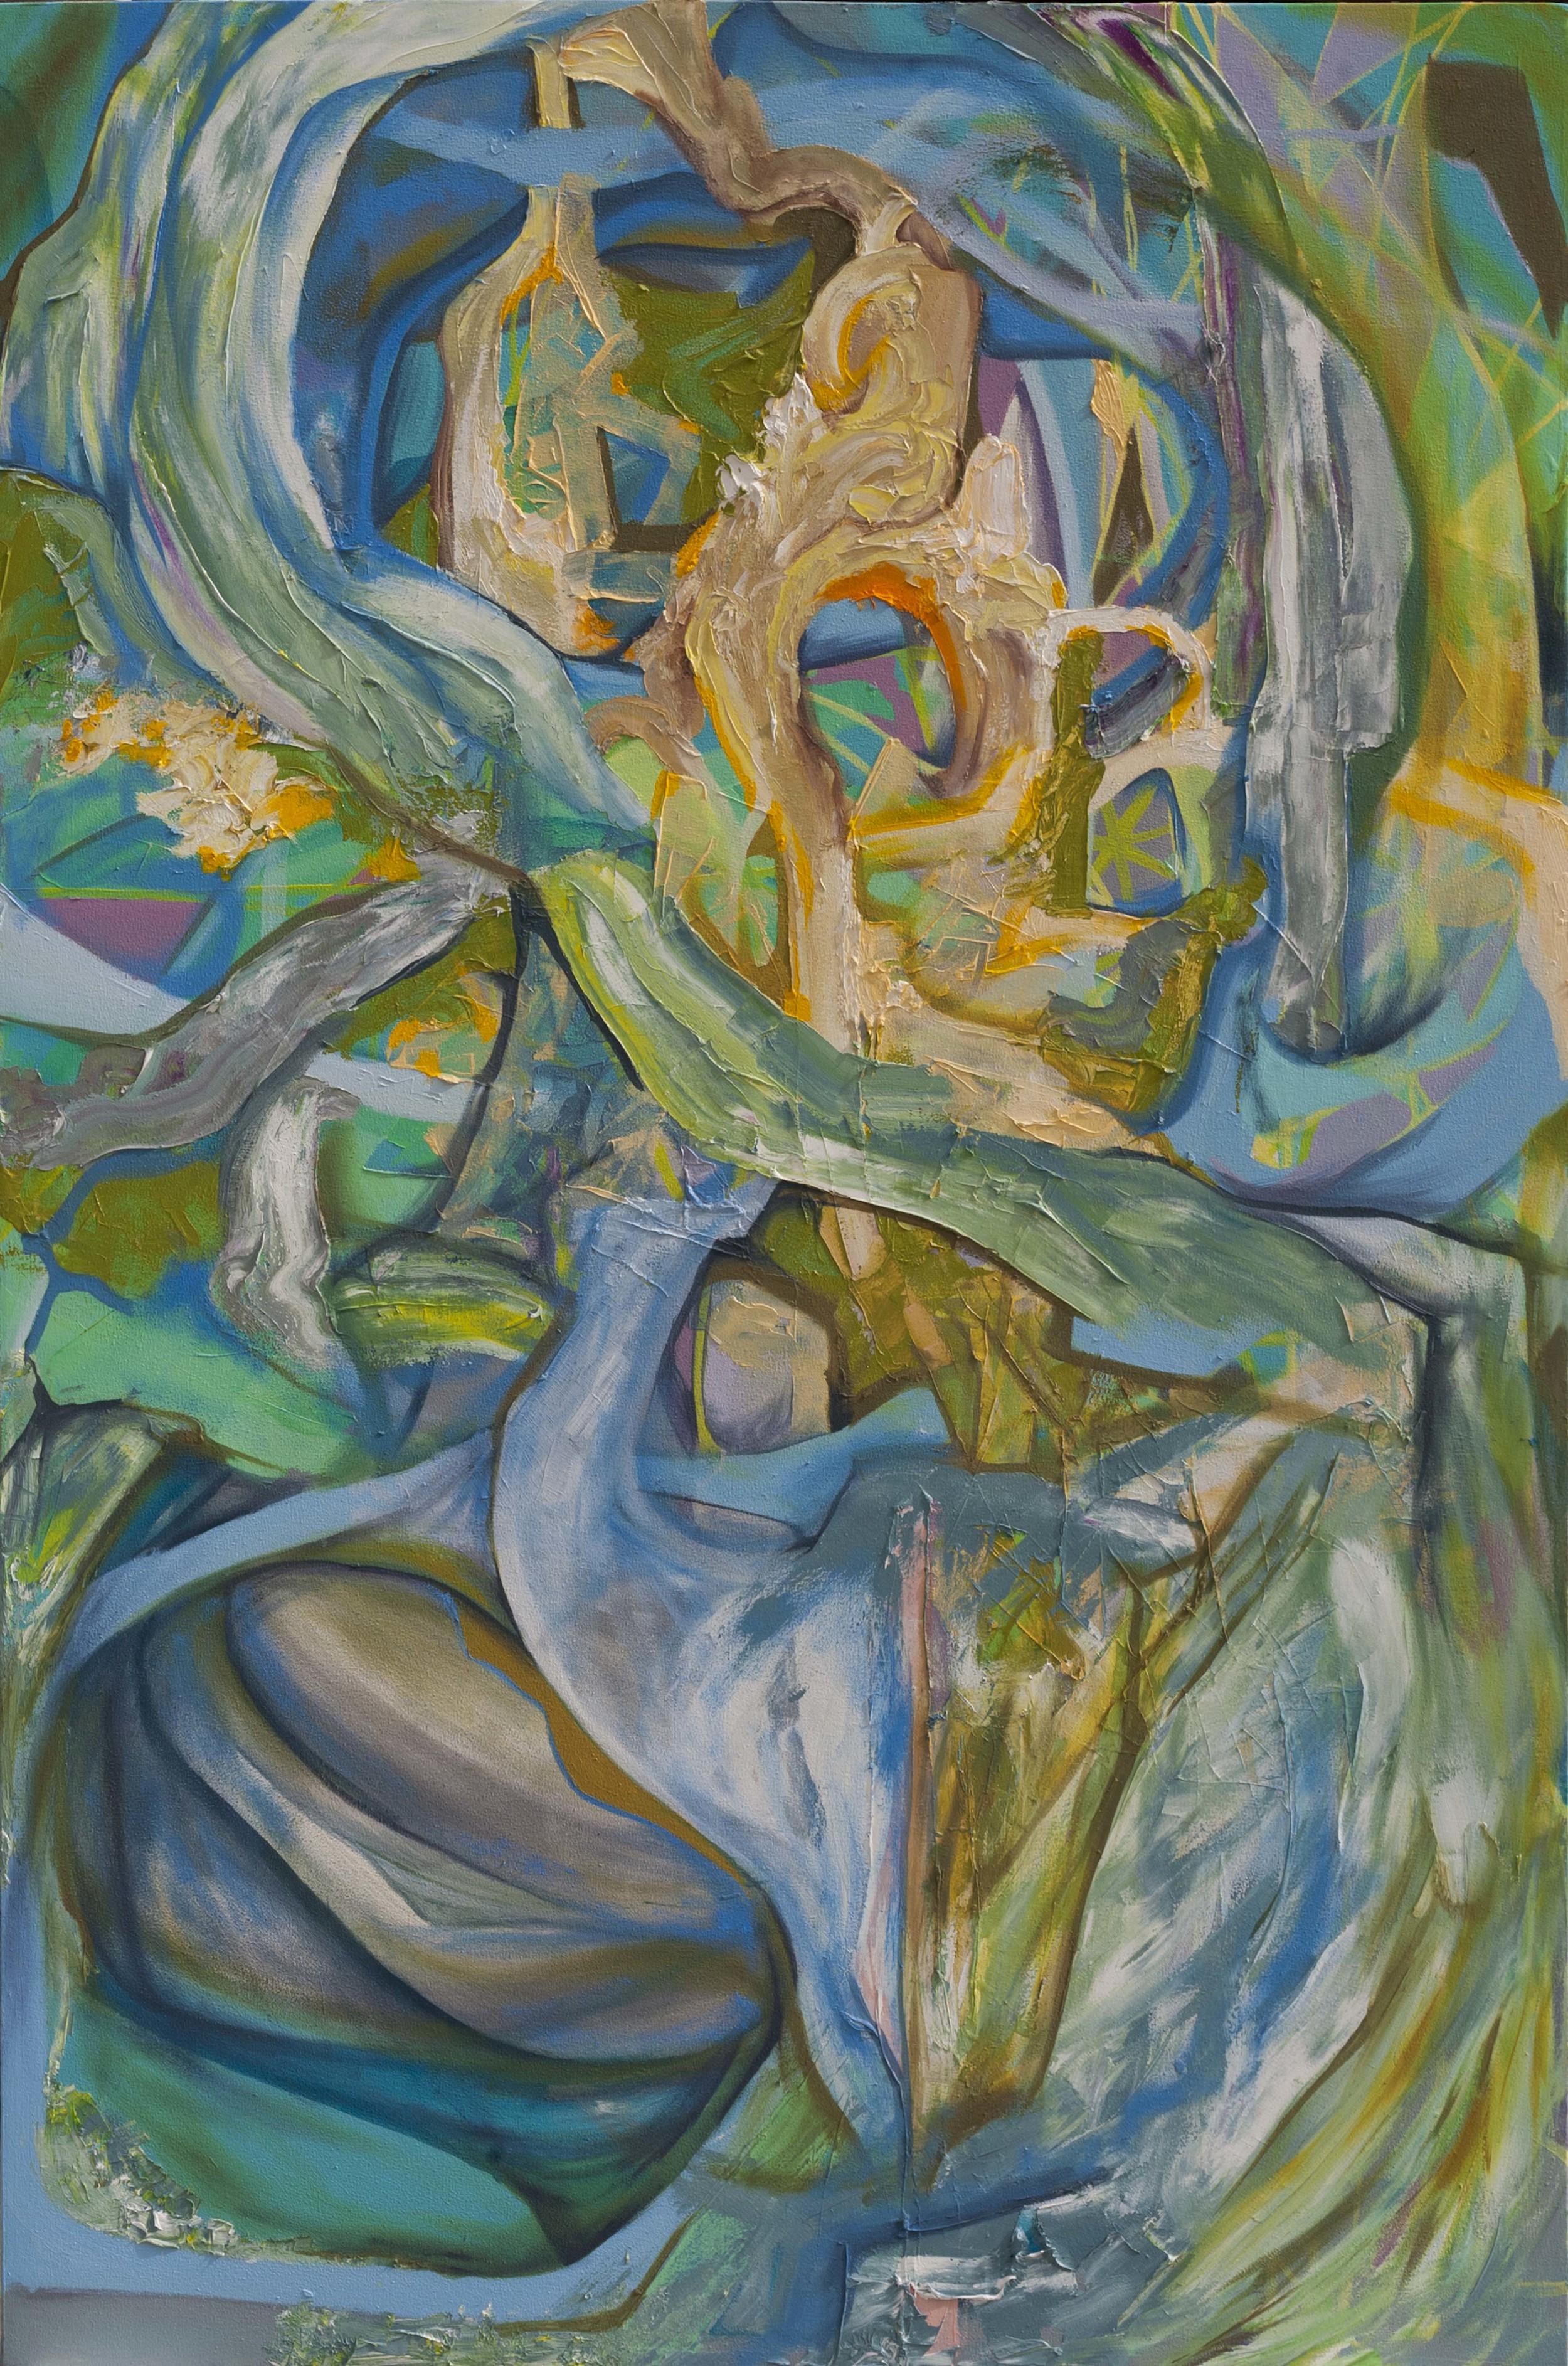 "Gem Guts, oil on canvas, 72"" x 48"", 2015"